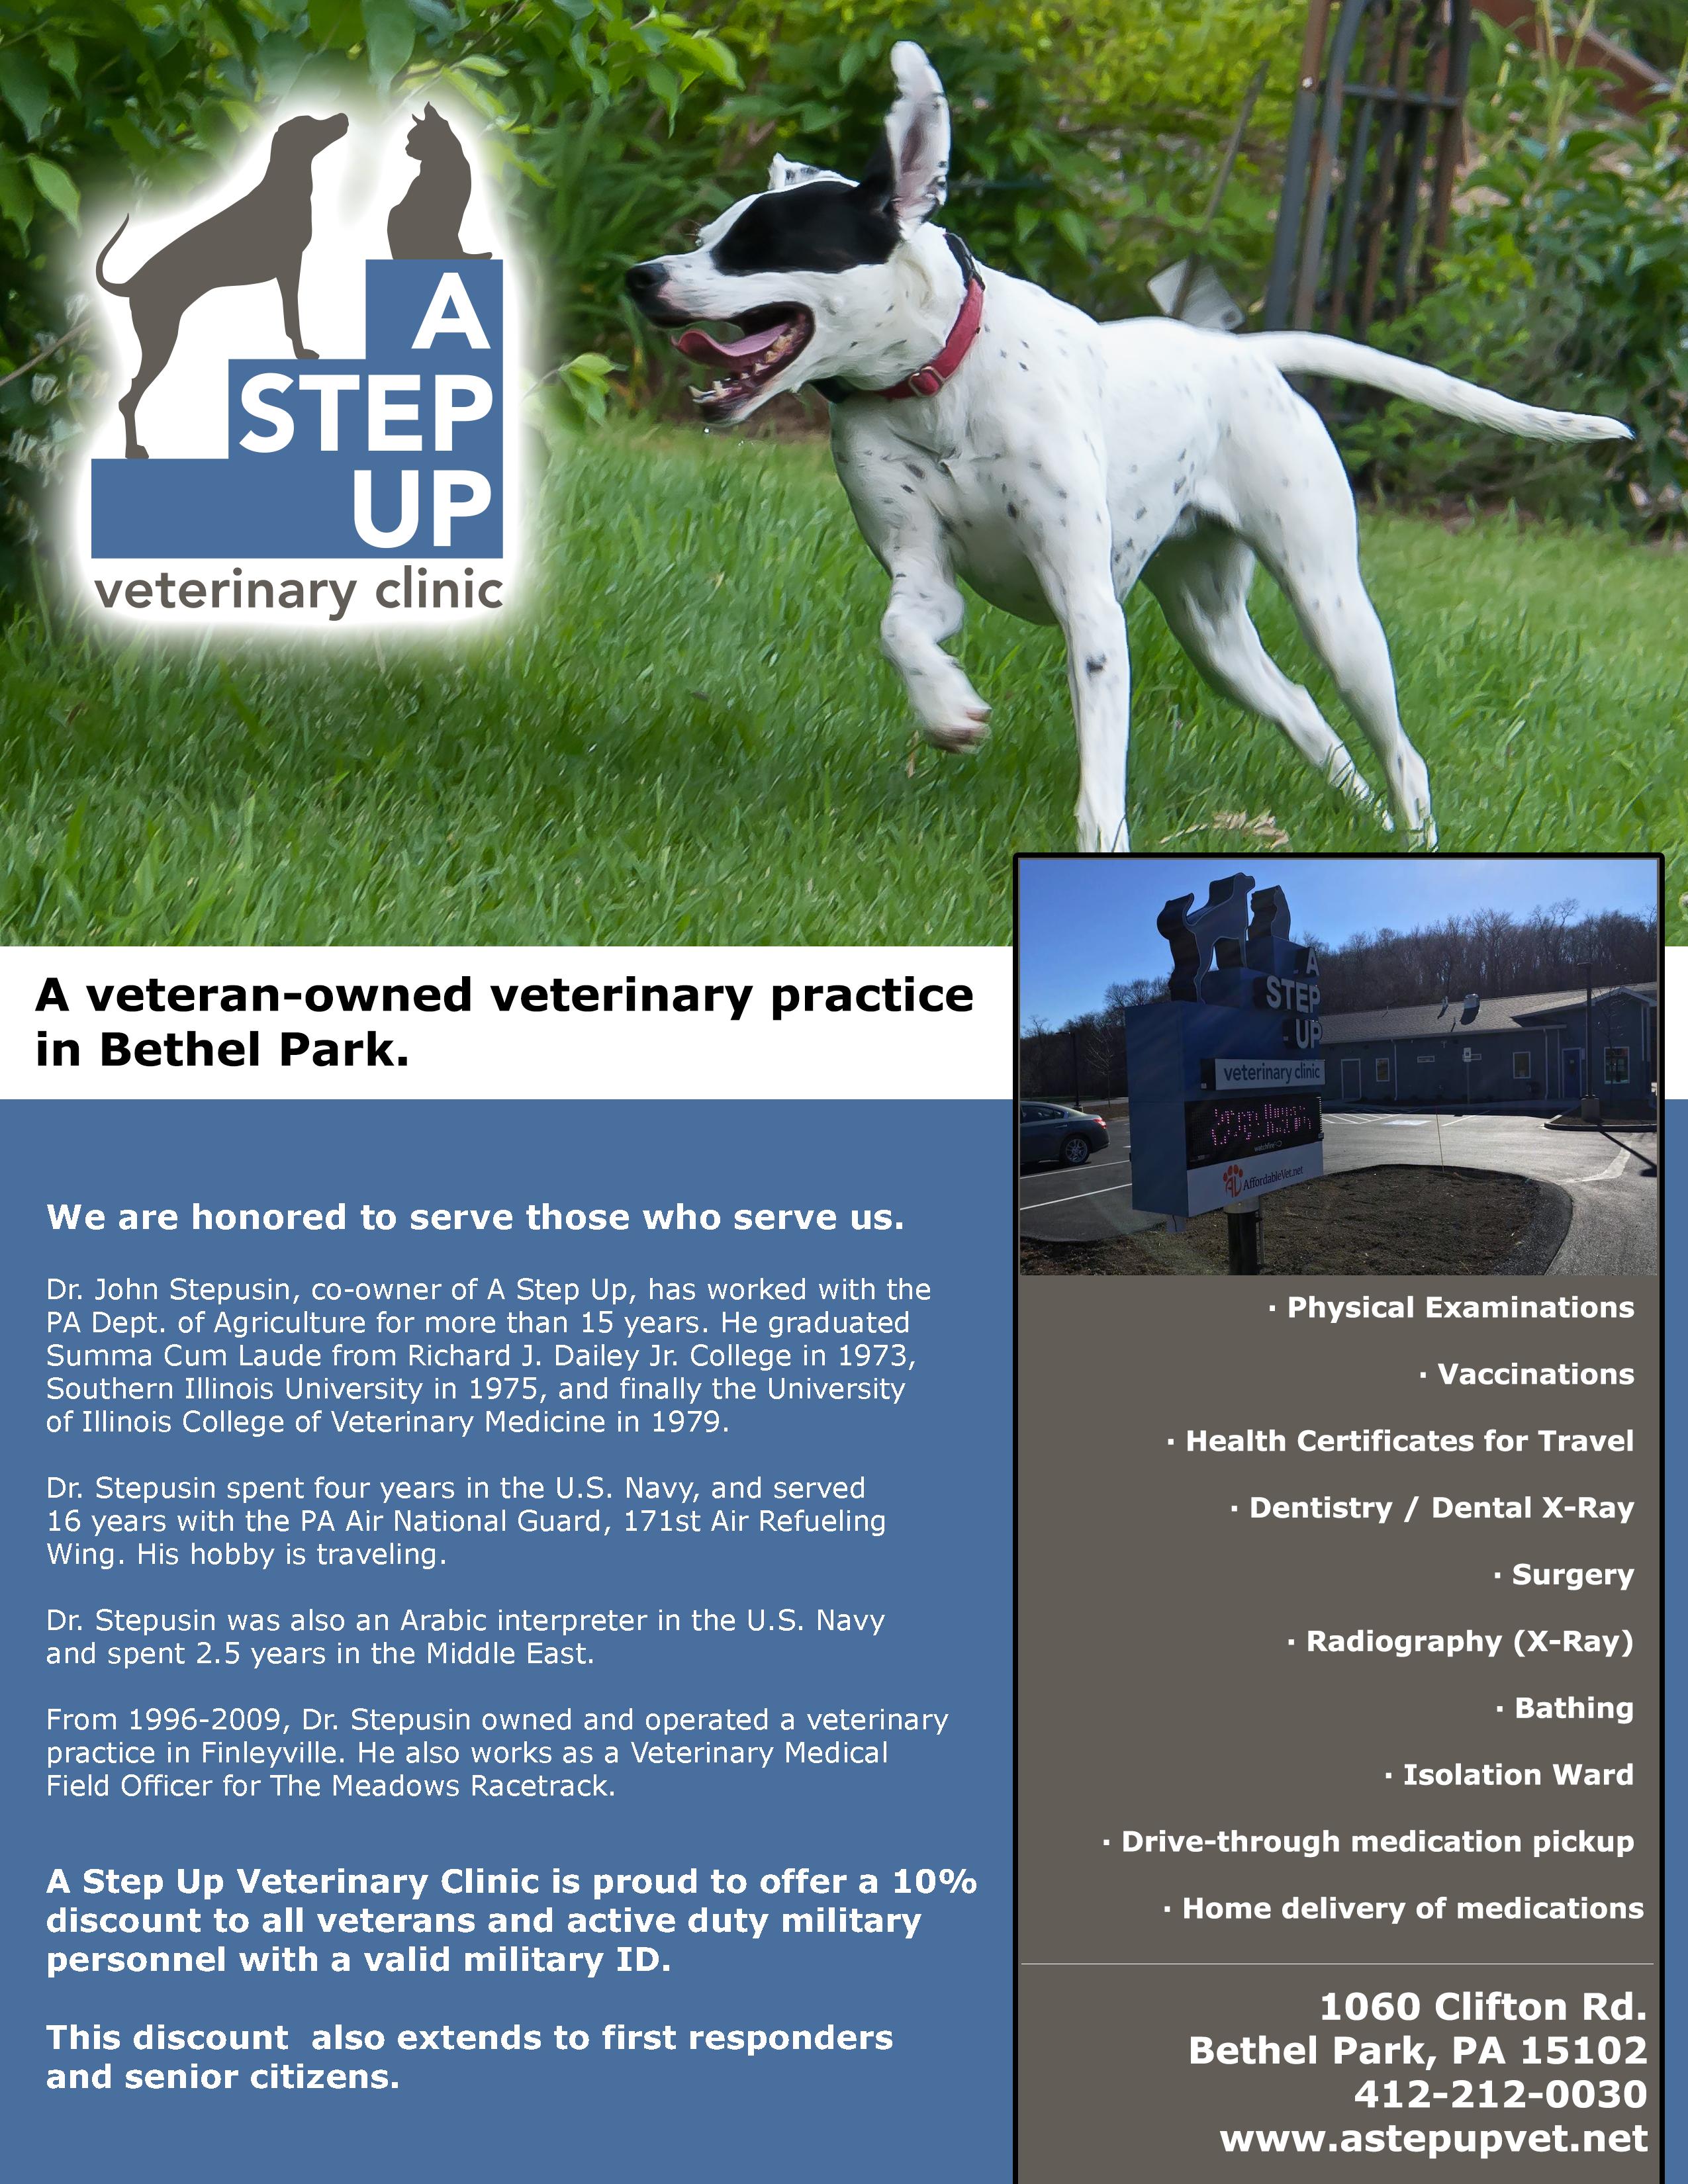 A Step Up Veterinary Clinic - Bethel Park, PA